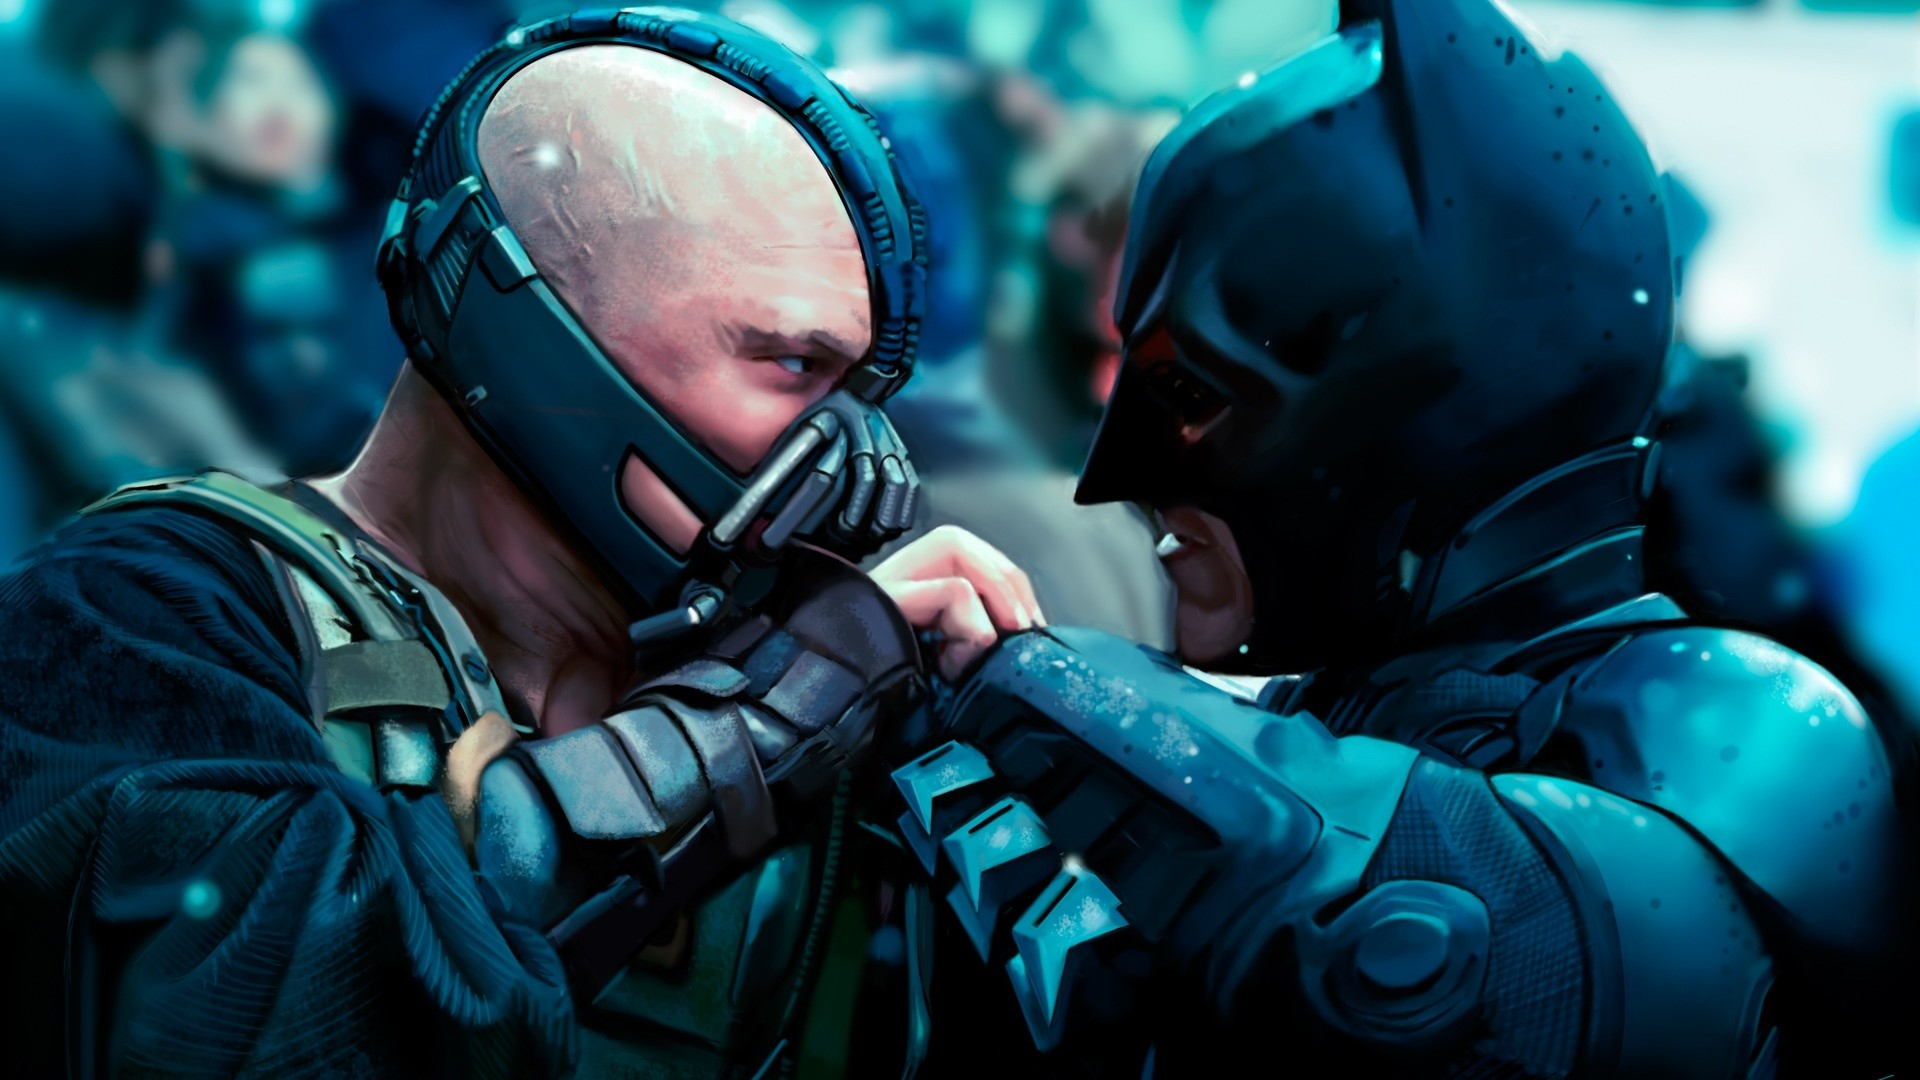 Bane Batman Dark Knight Rises Wallpapers Hd 1080p Movie Desktop